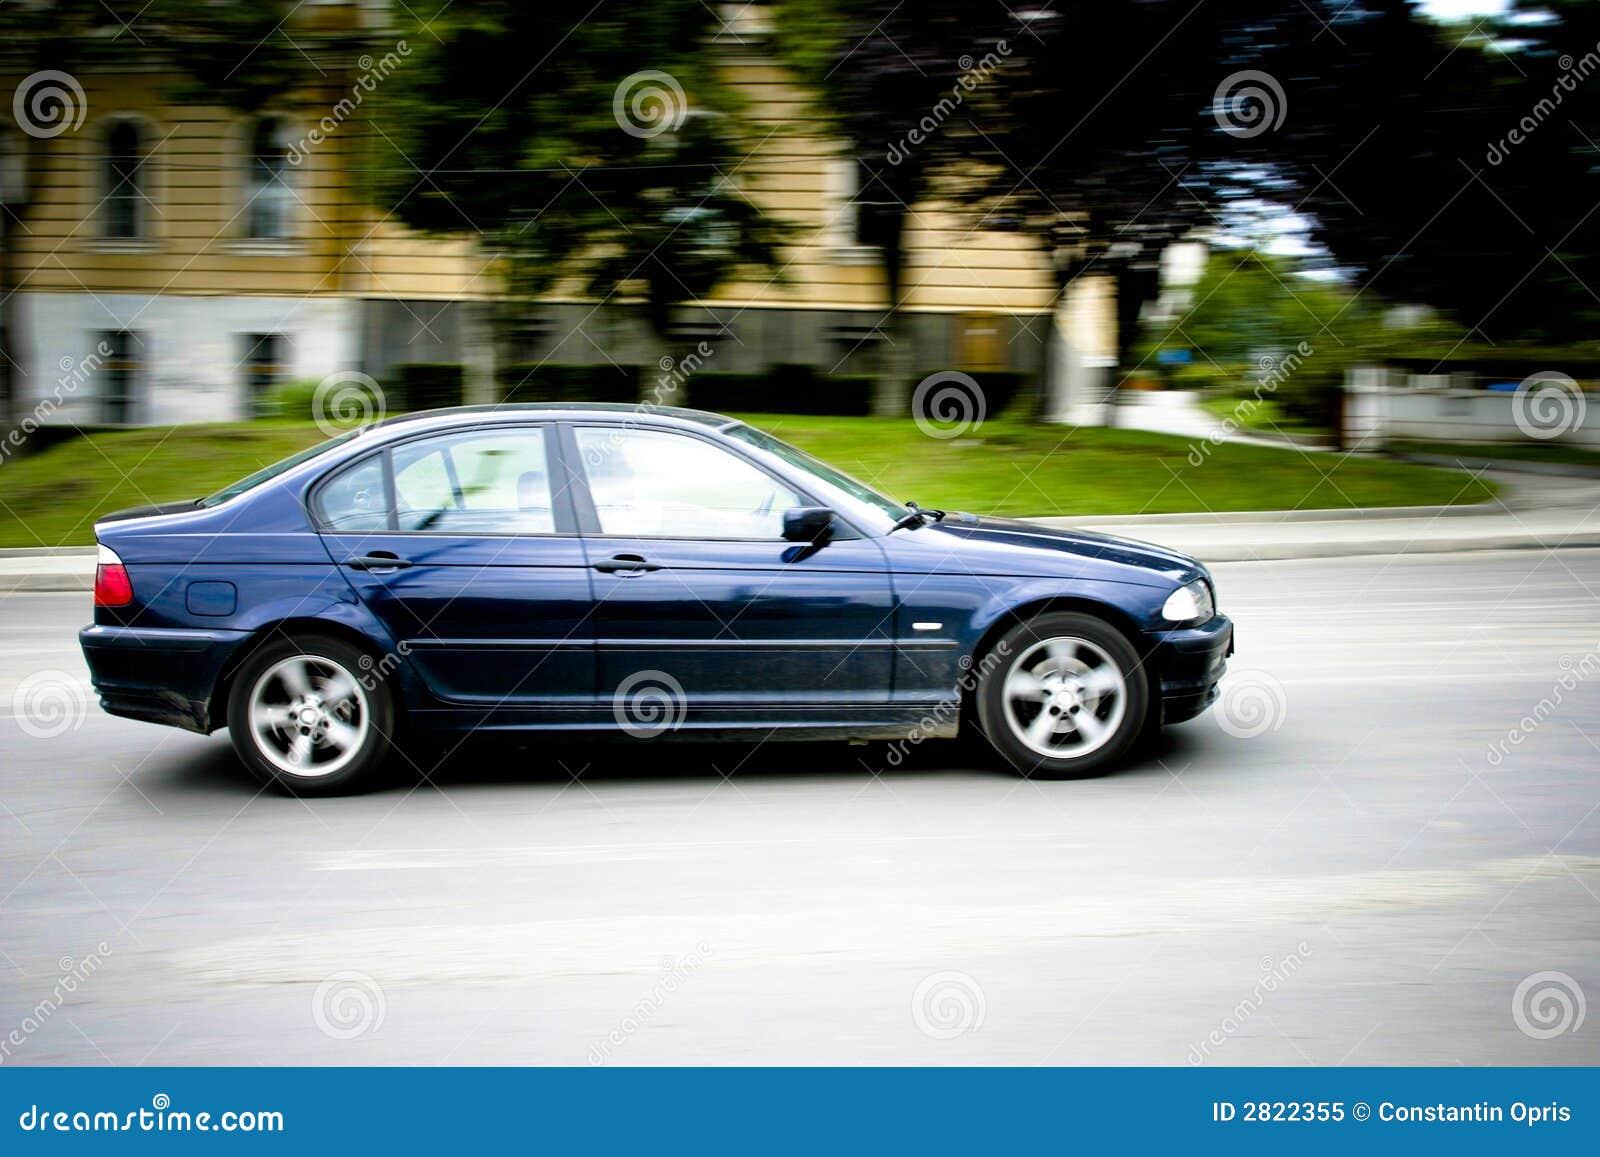 Car speeding down street stock image. Image of transportation - 2822355